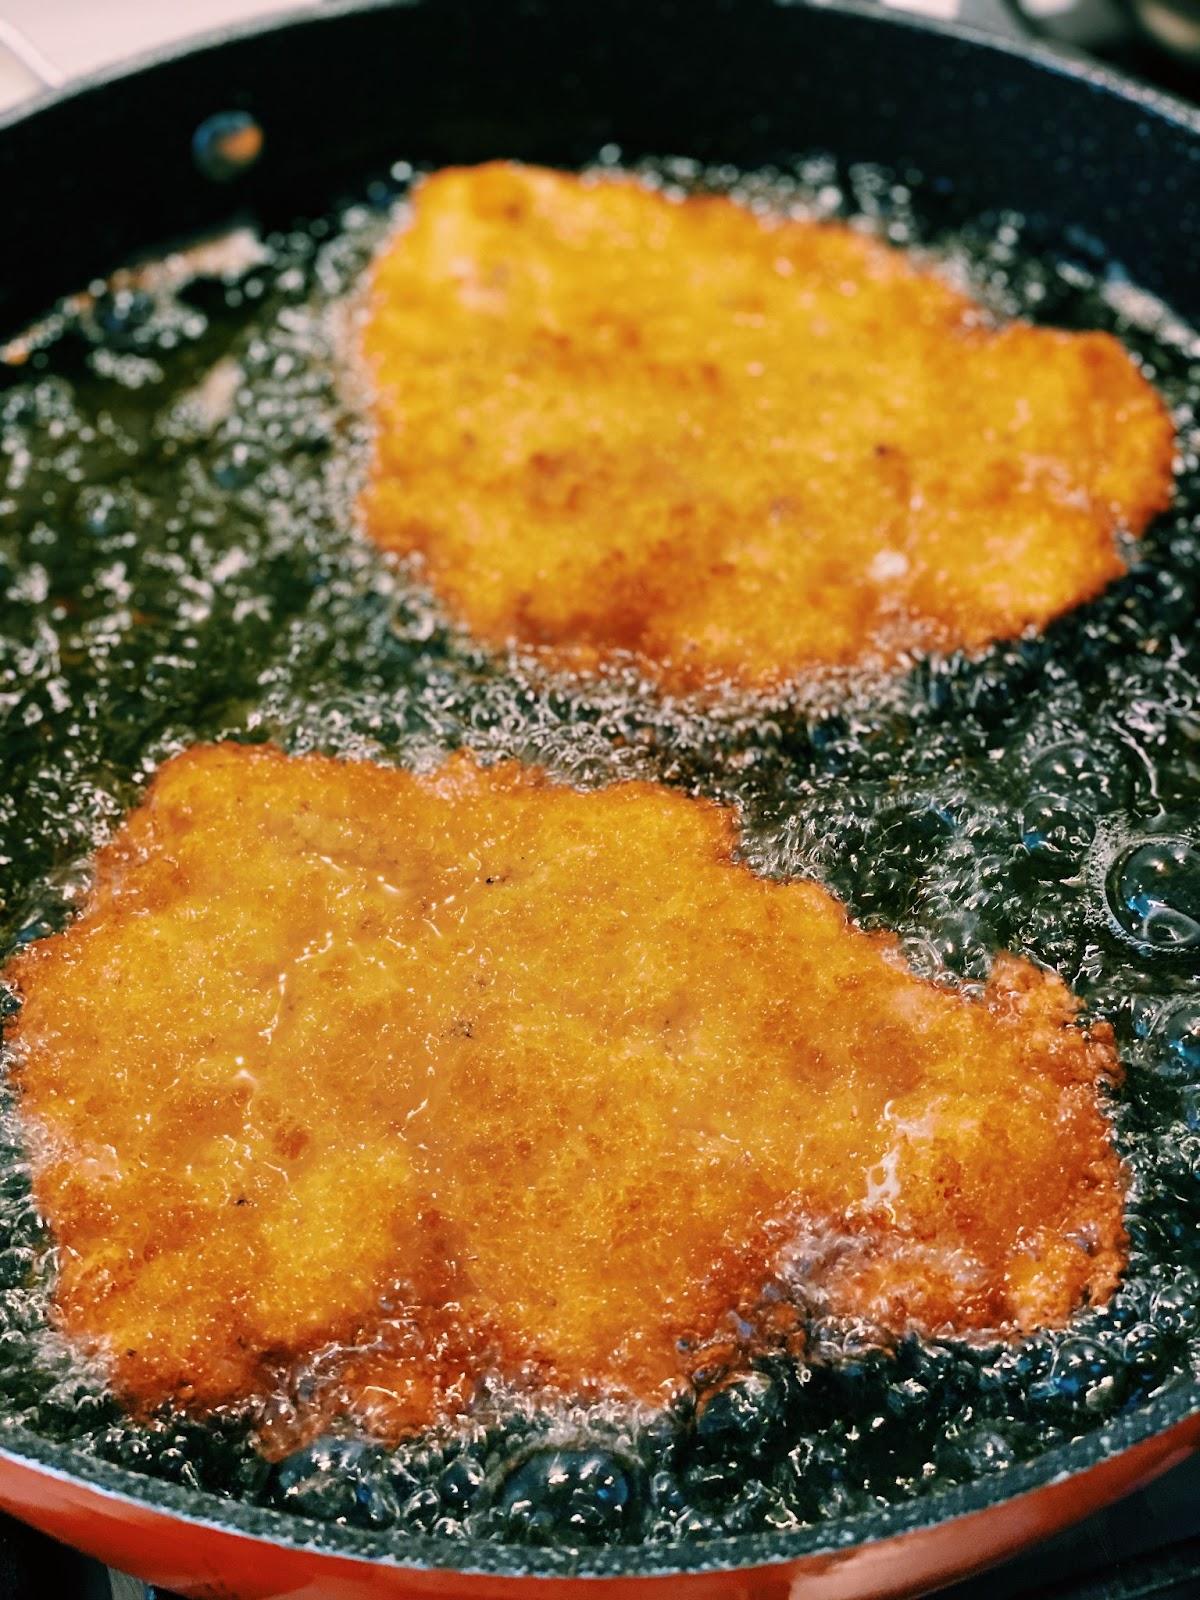 Japanese Fried Chicken Cutlet